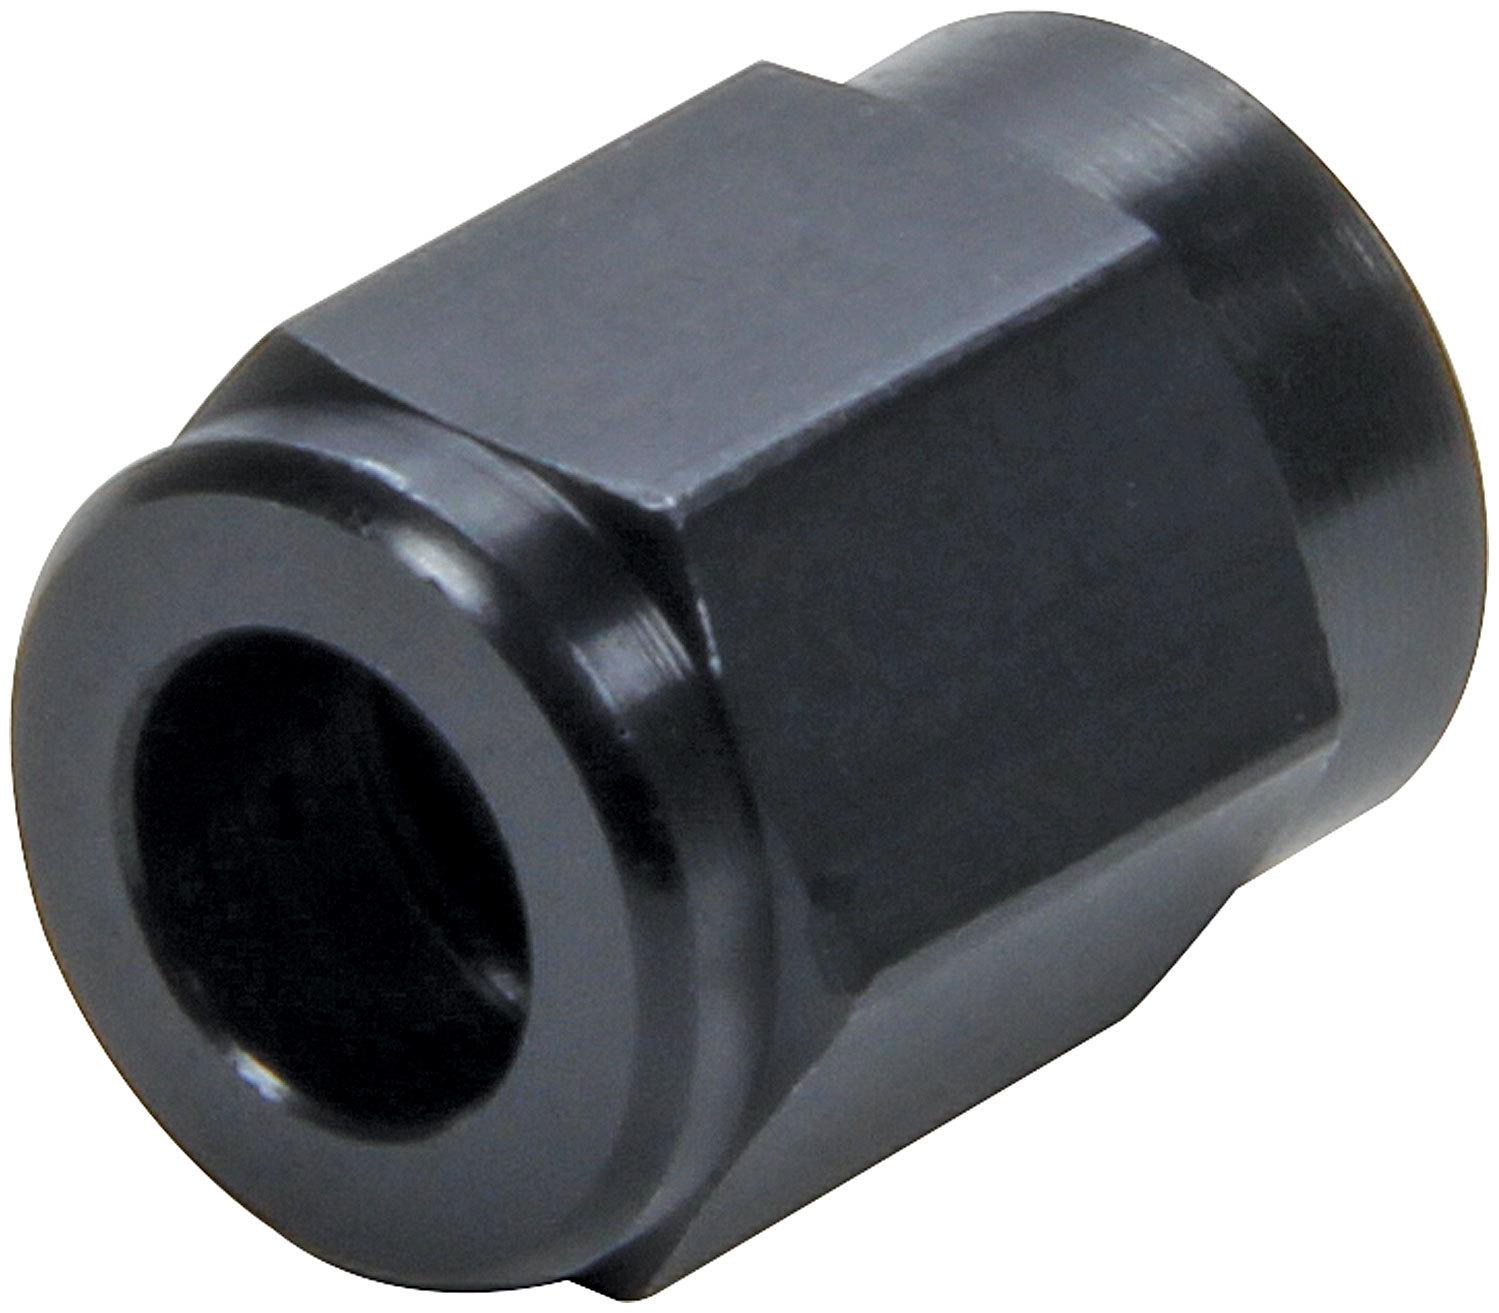 Allstar Performance 50320 Fitting, Tube Nut, 3 AN, 3/16 in Tube, Aluminum, Black Anodize, Pair